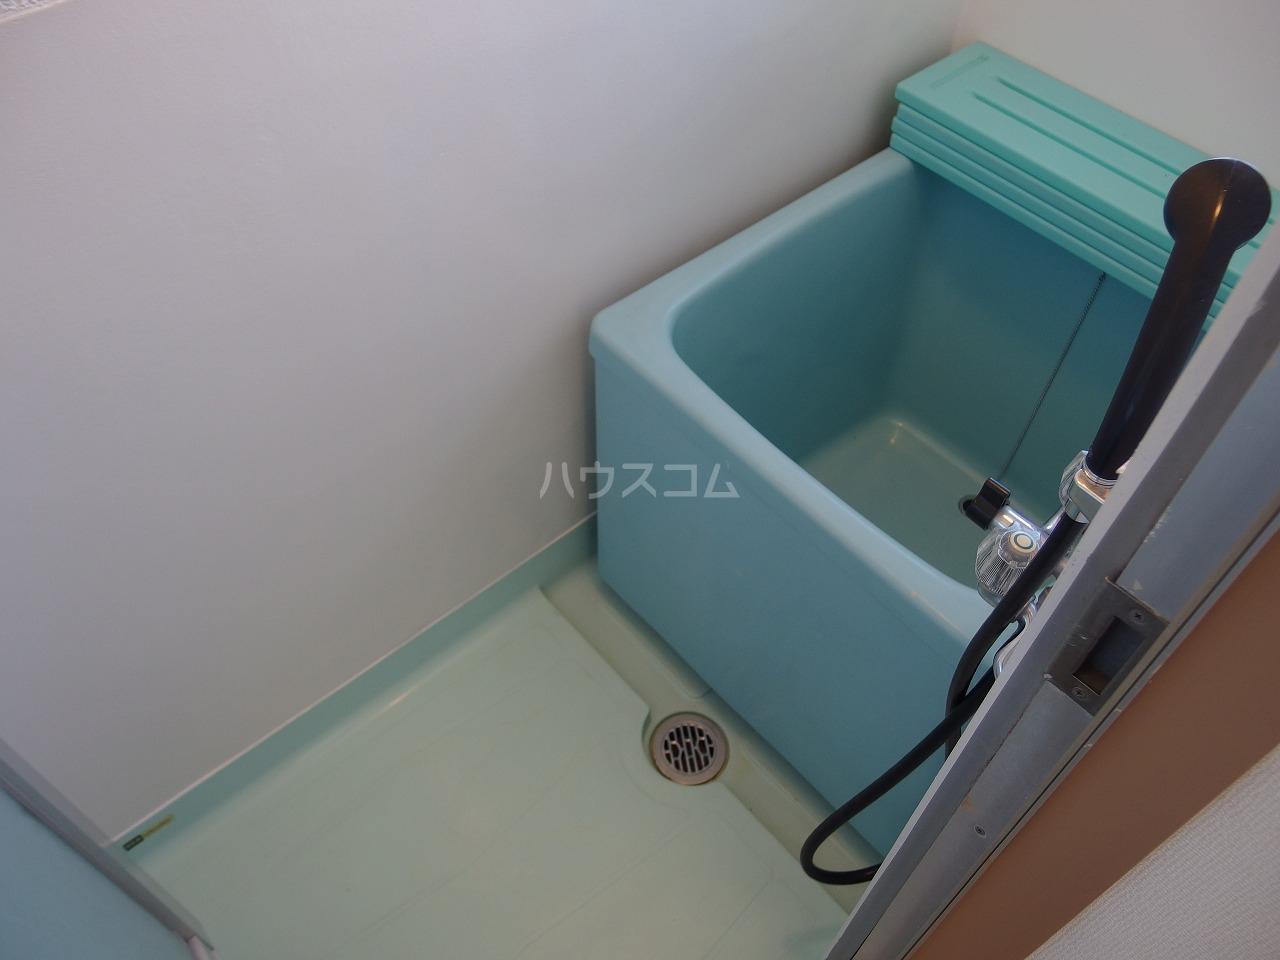 Villa松原 202号室の風呂